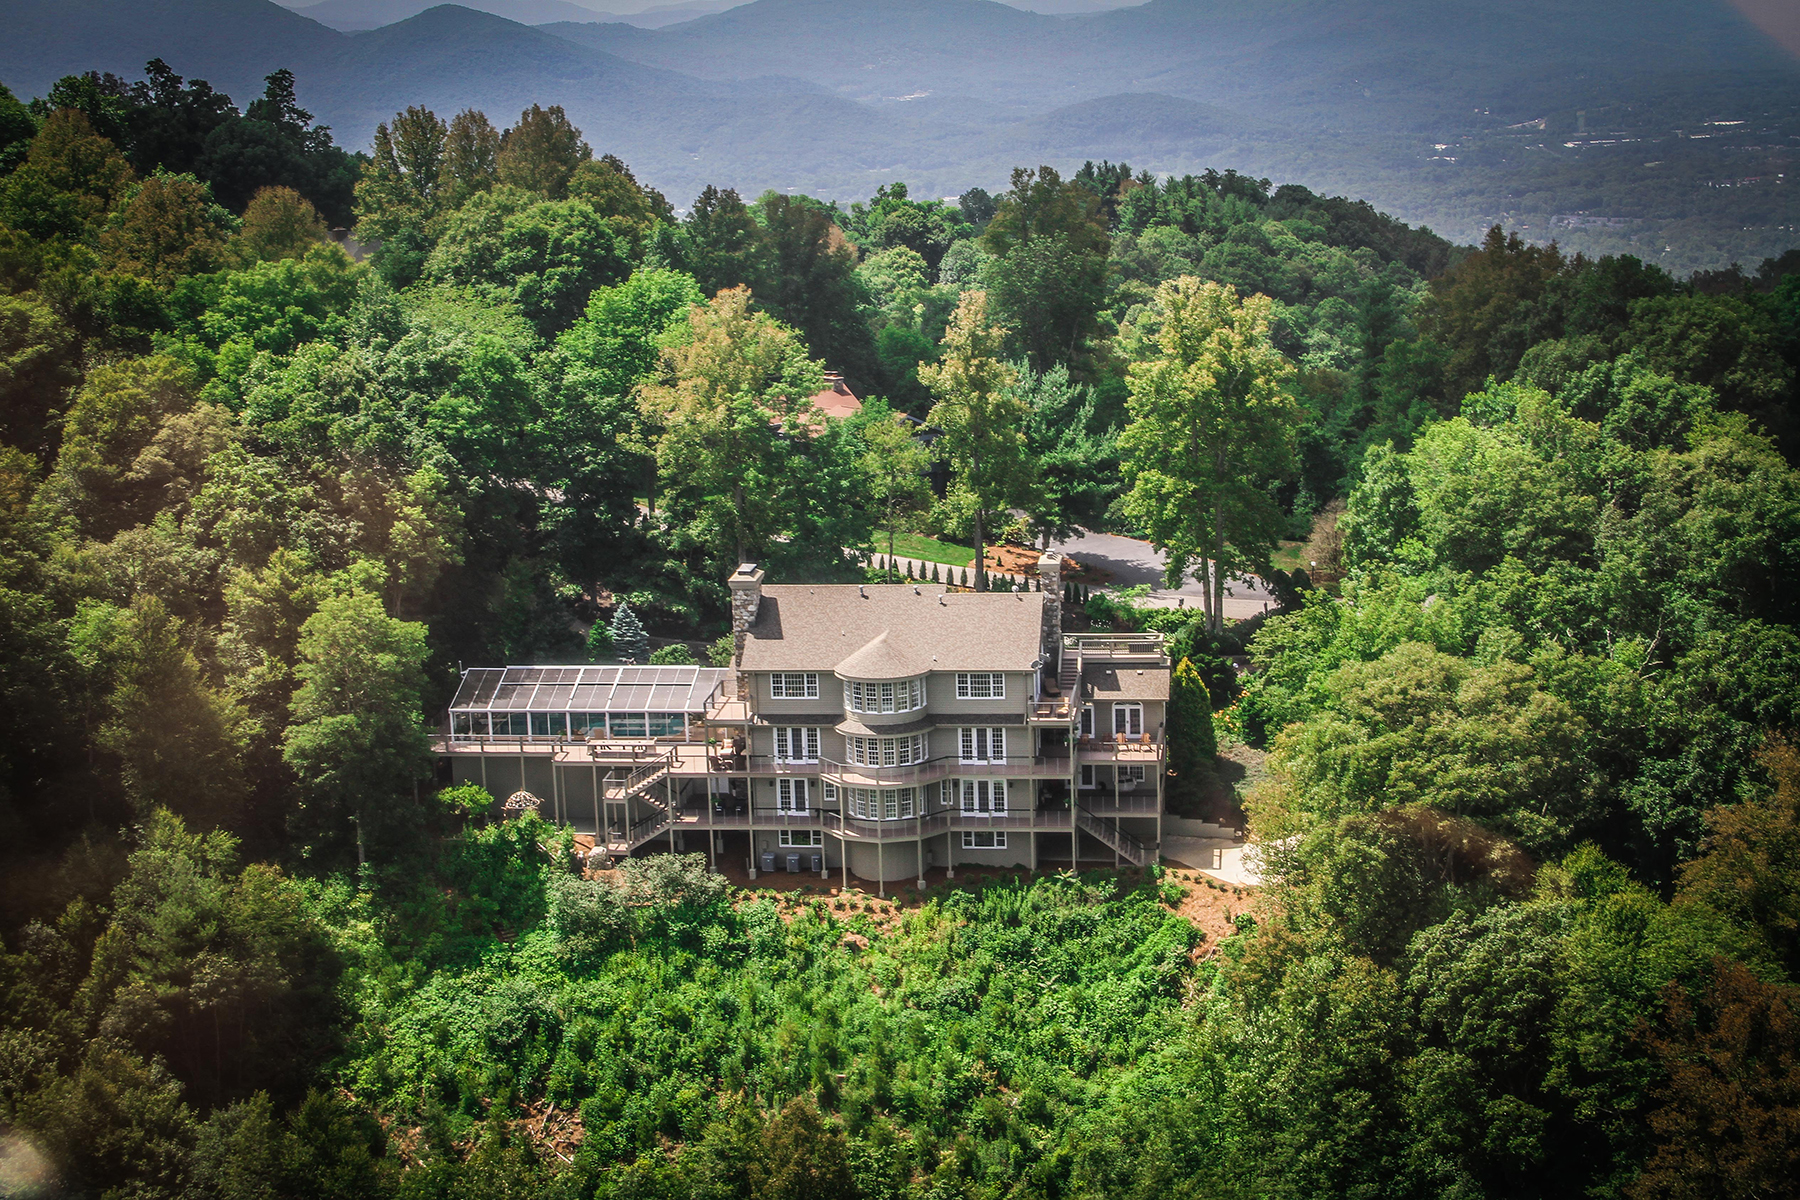 Single Family Home for Sale at ASHEVILLE 35 Peach Knob Dr Asheville, North Carolina, 28804 United States